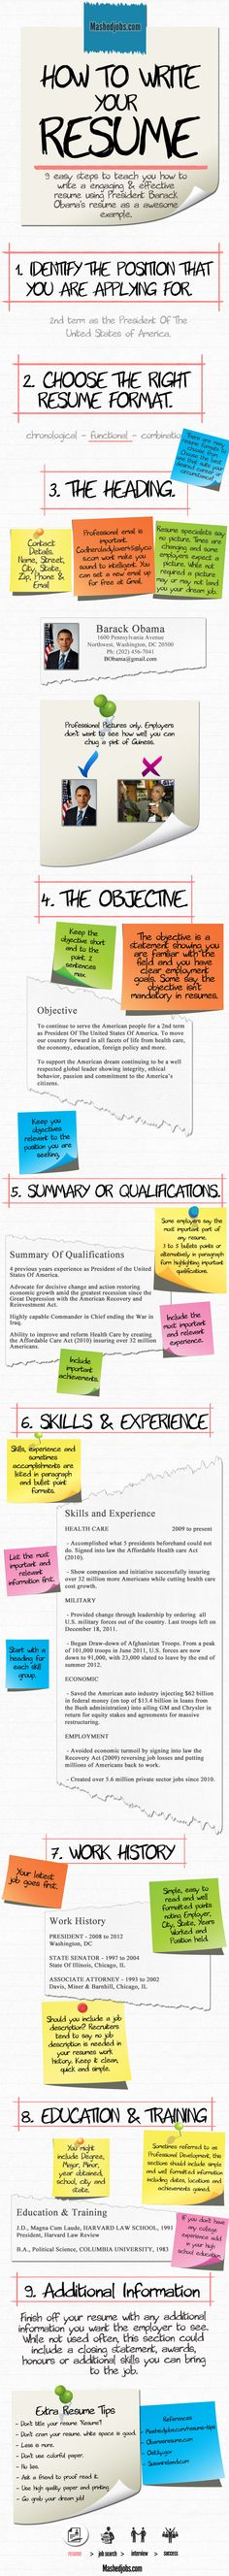 How to Write Your Resume #veredus